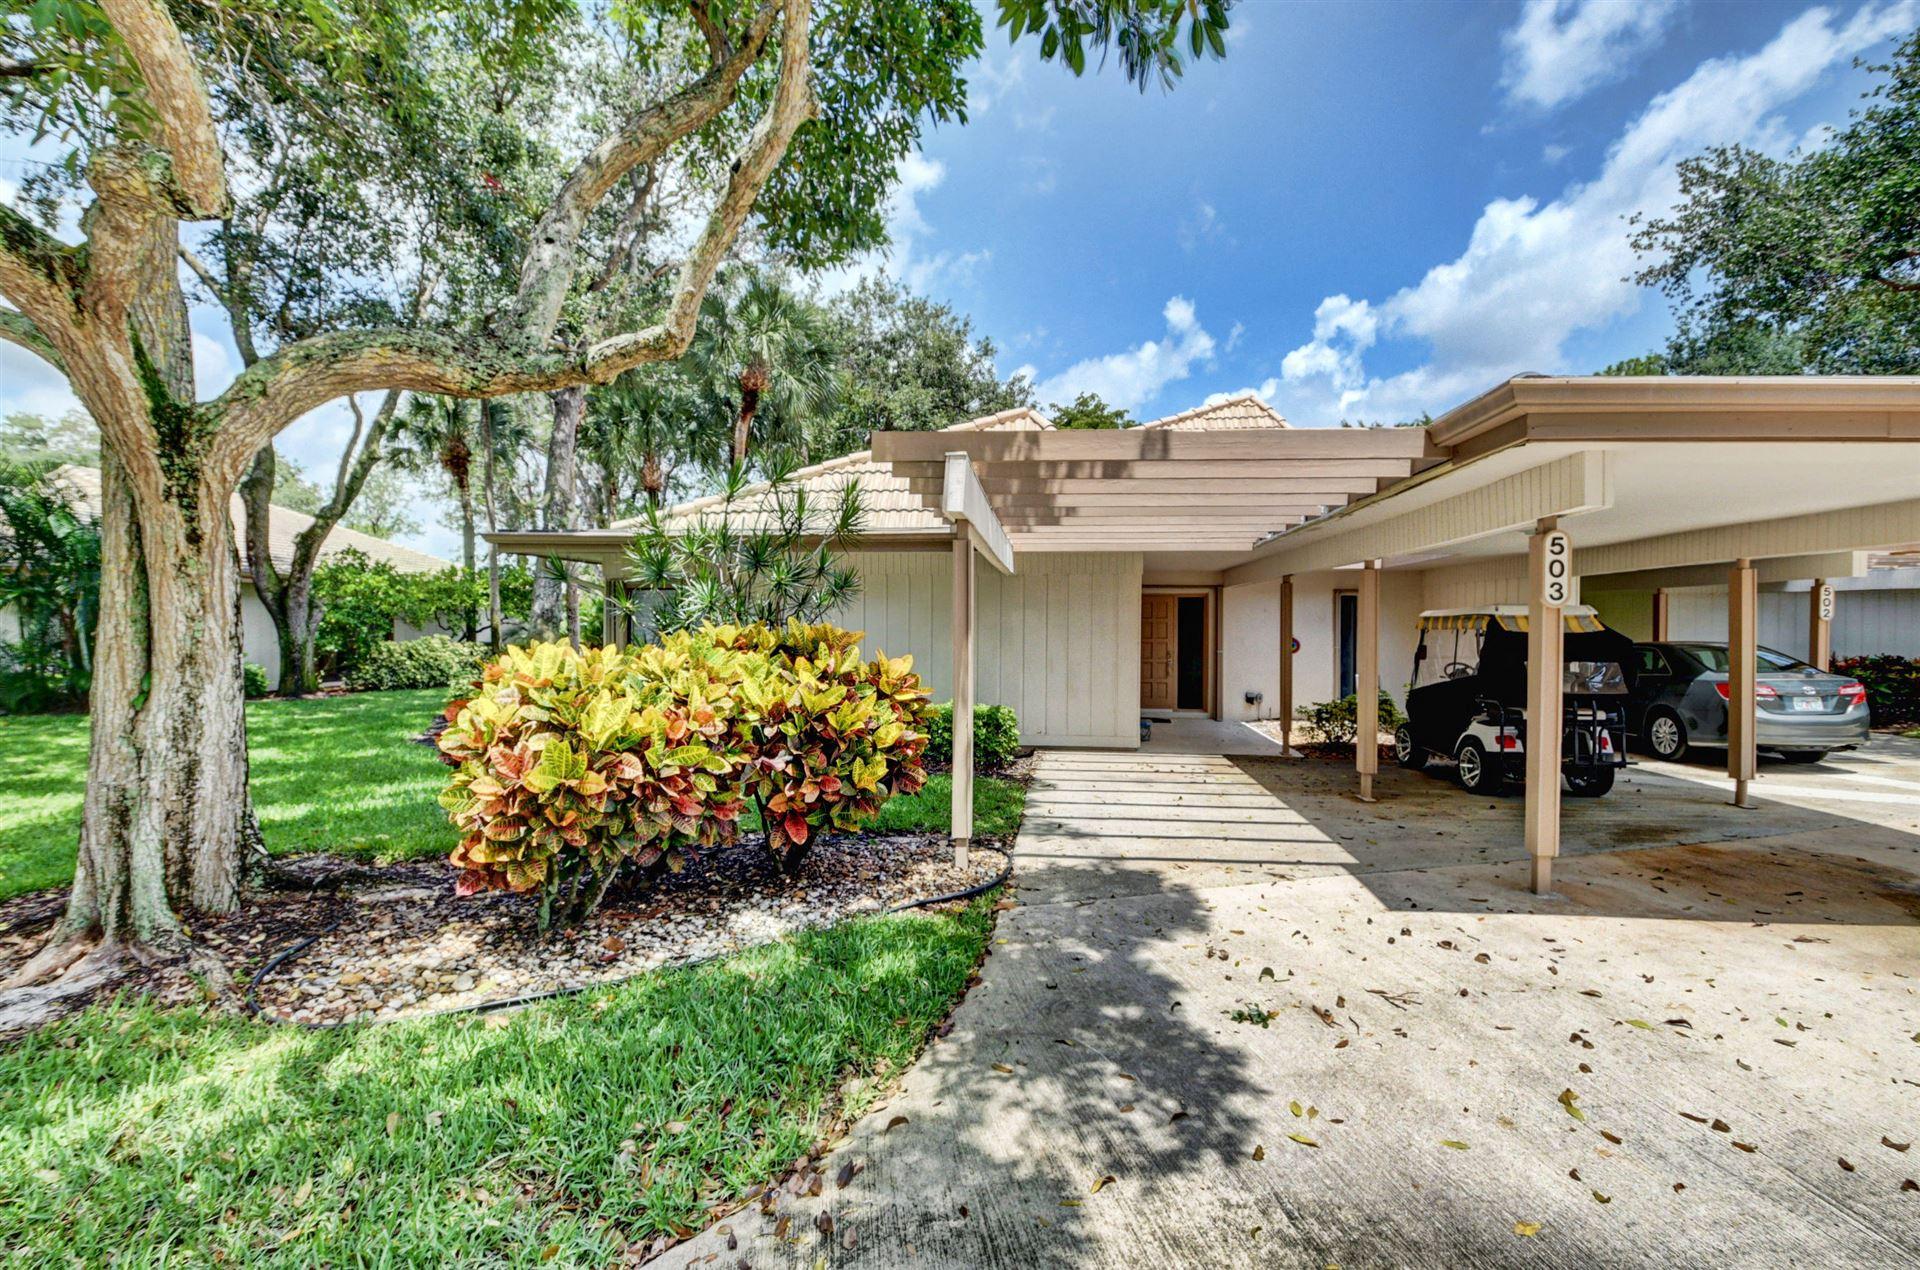 503 Bridgewood Court #503, Boca Raton, FL 33434 - #: RX-10623973